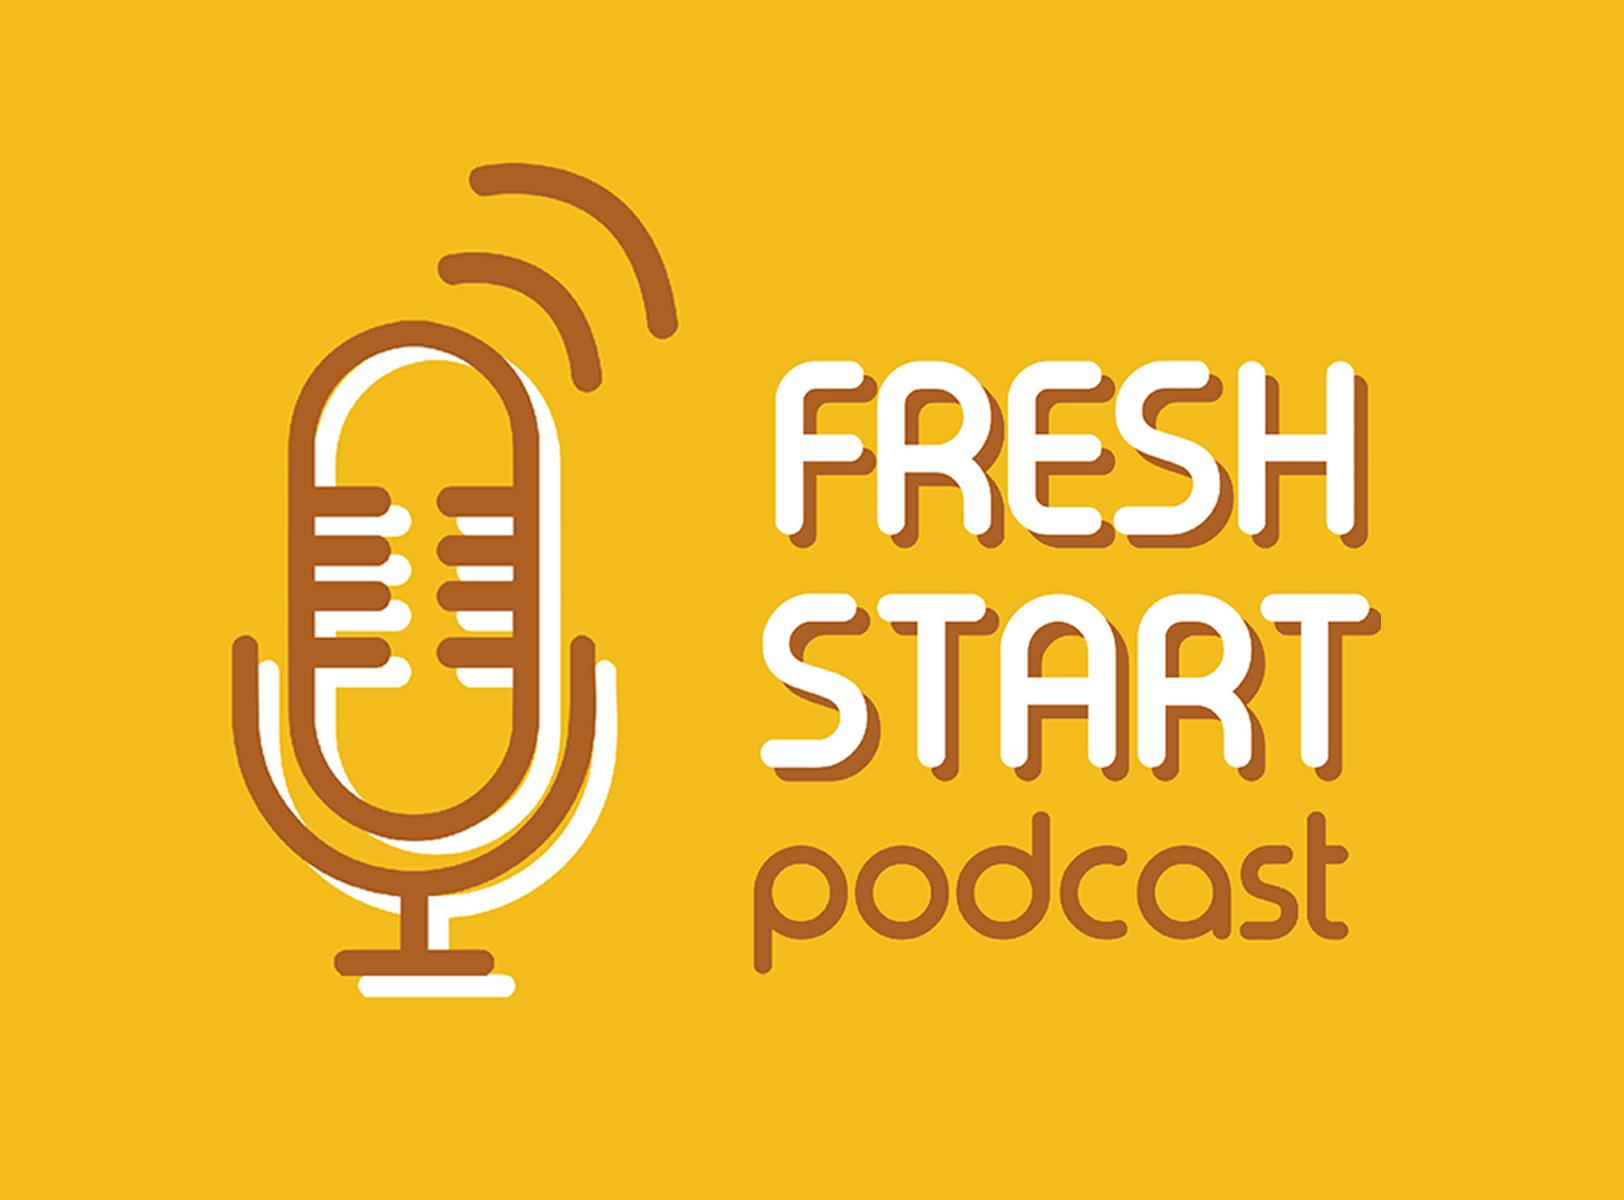 Fresh Start: Podcast News (10/18/2019 Fri.)